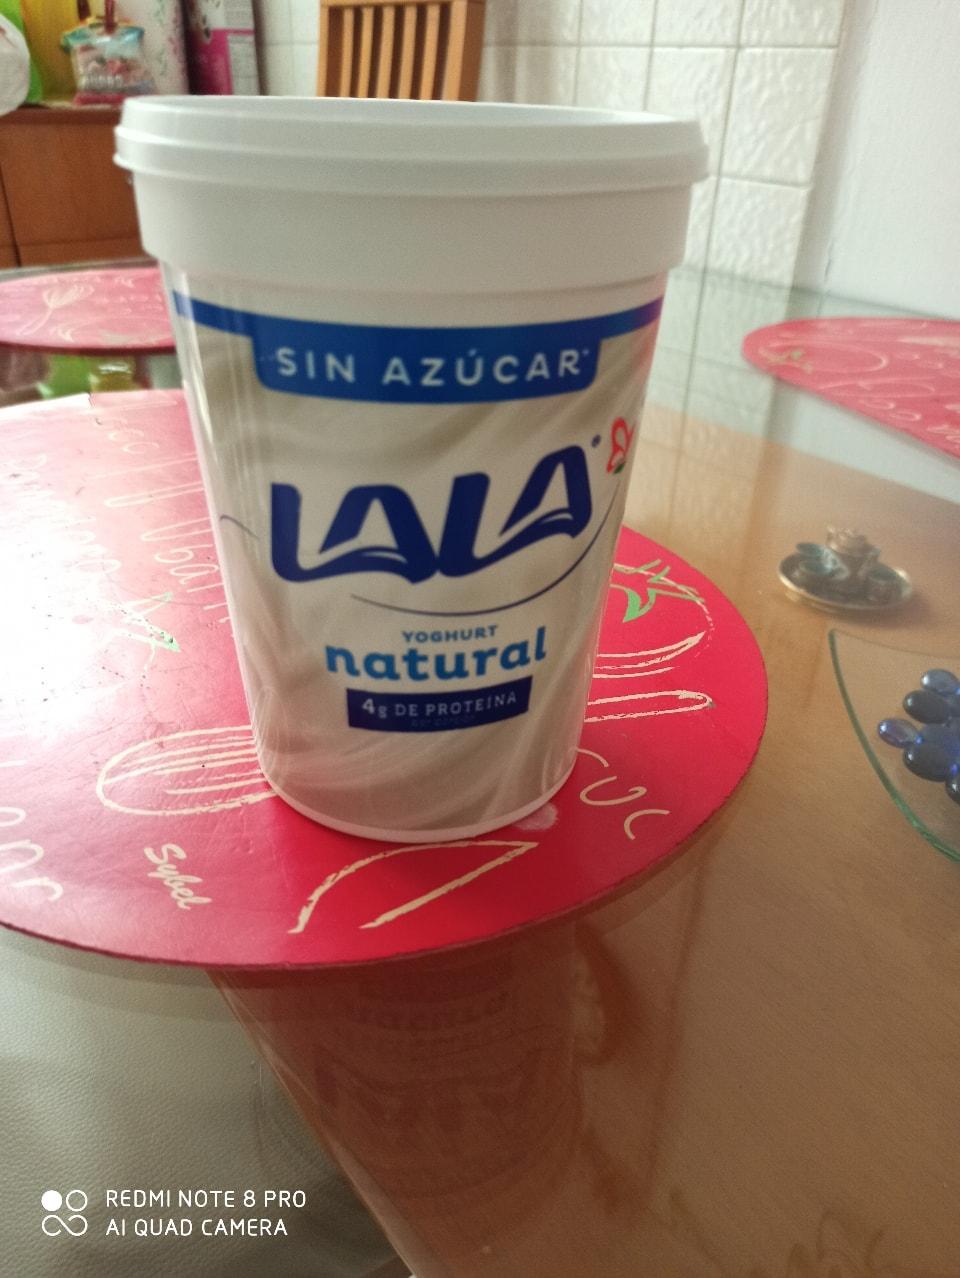 Yogurth natural 1 litro.